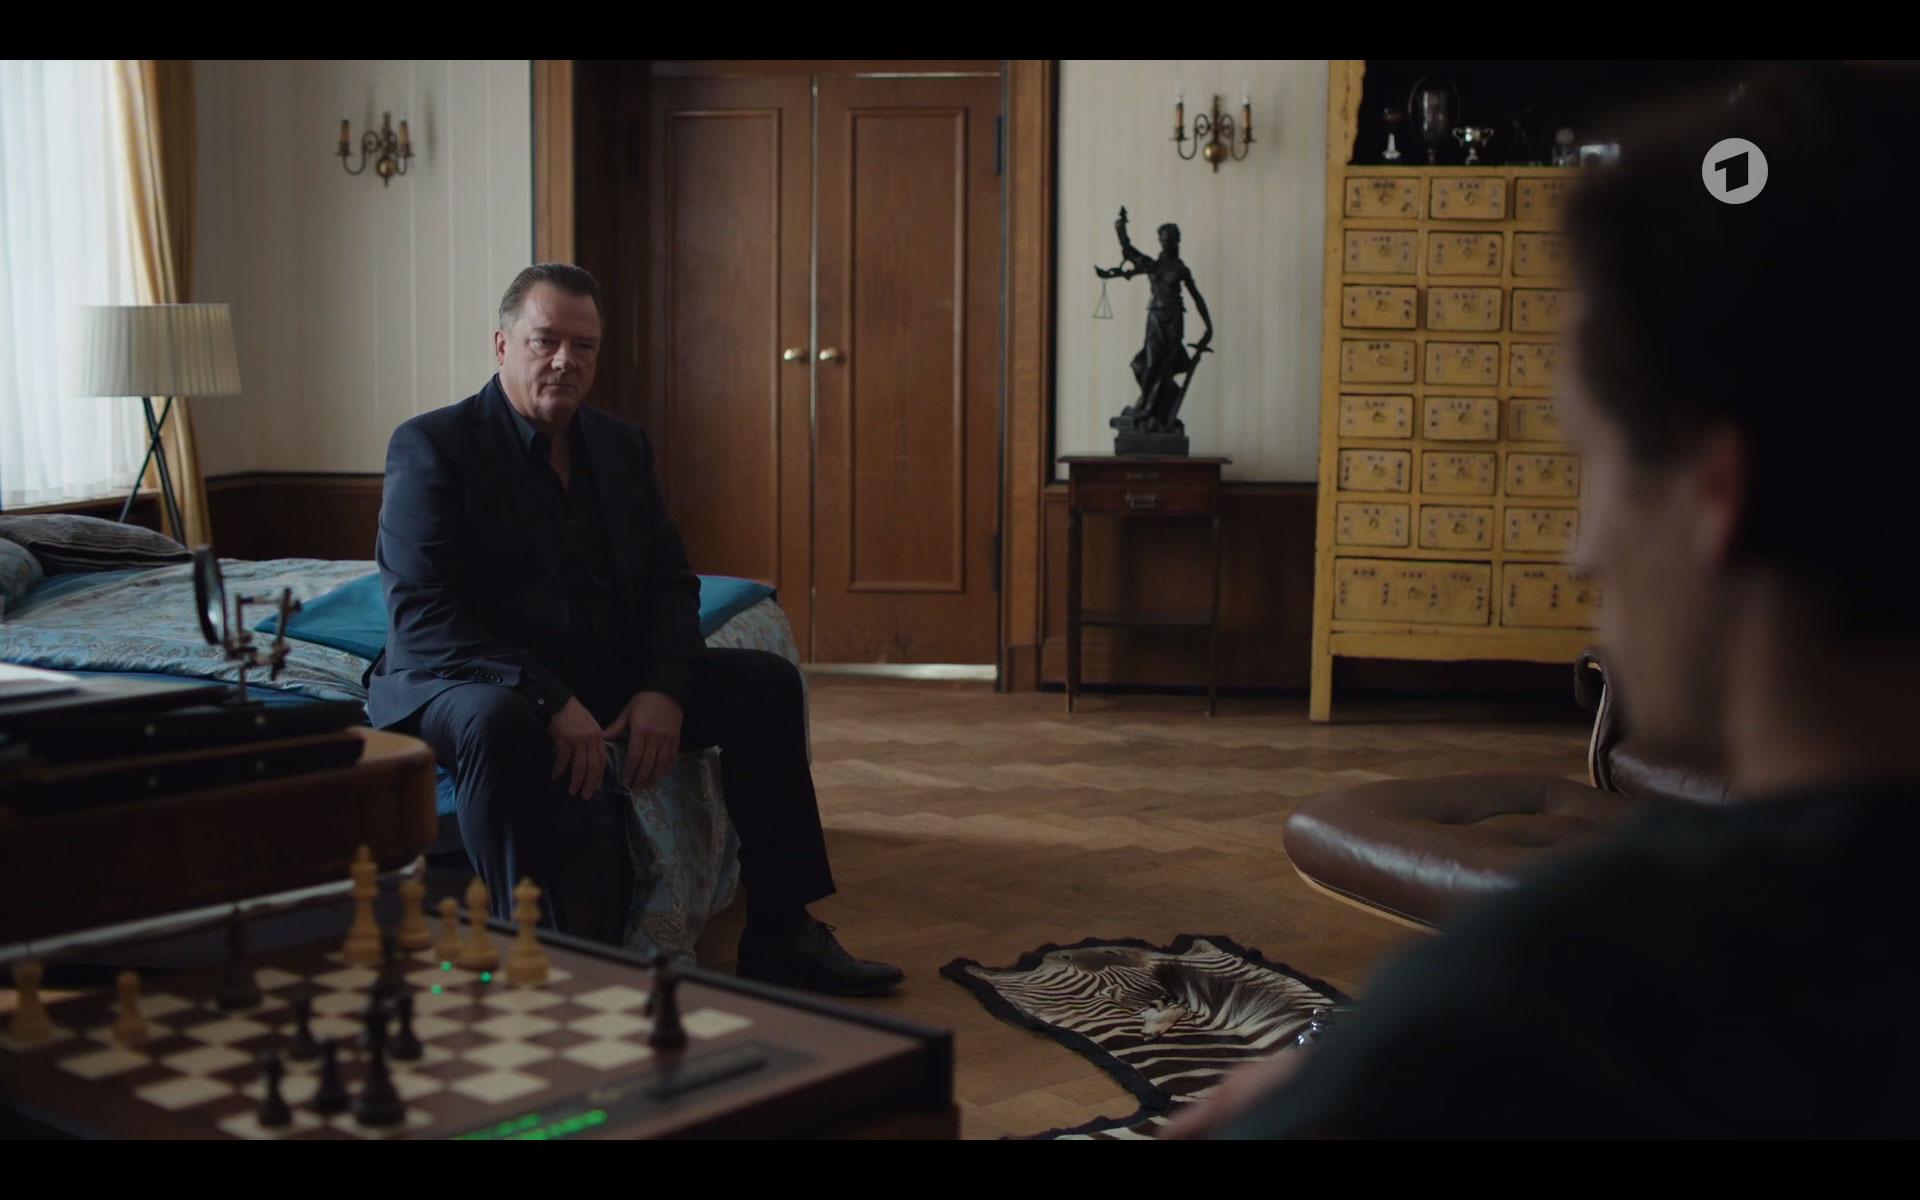 Tatort Das perfekte Verbrechen Schachcomputer Set